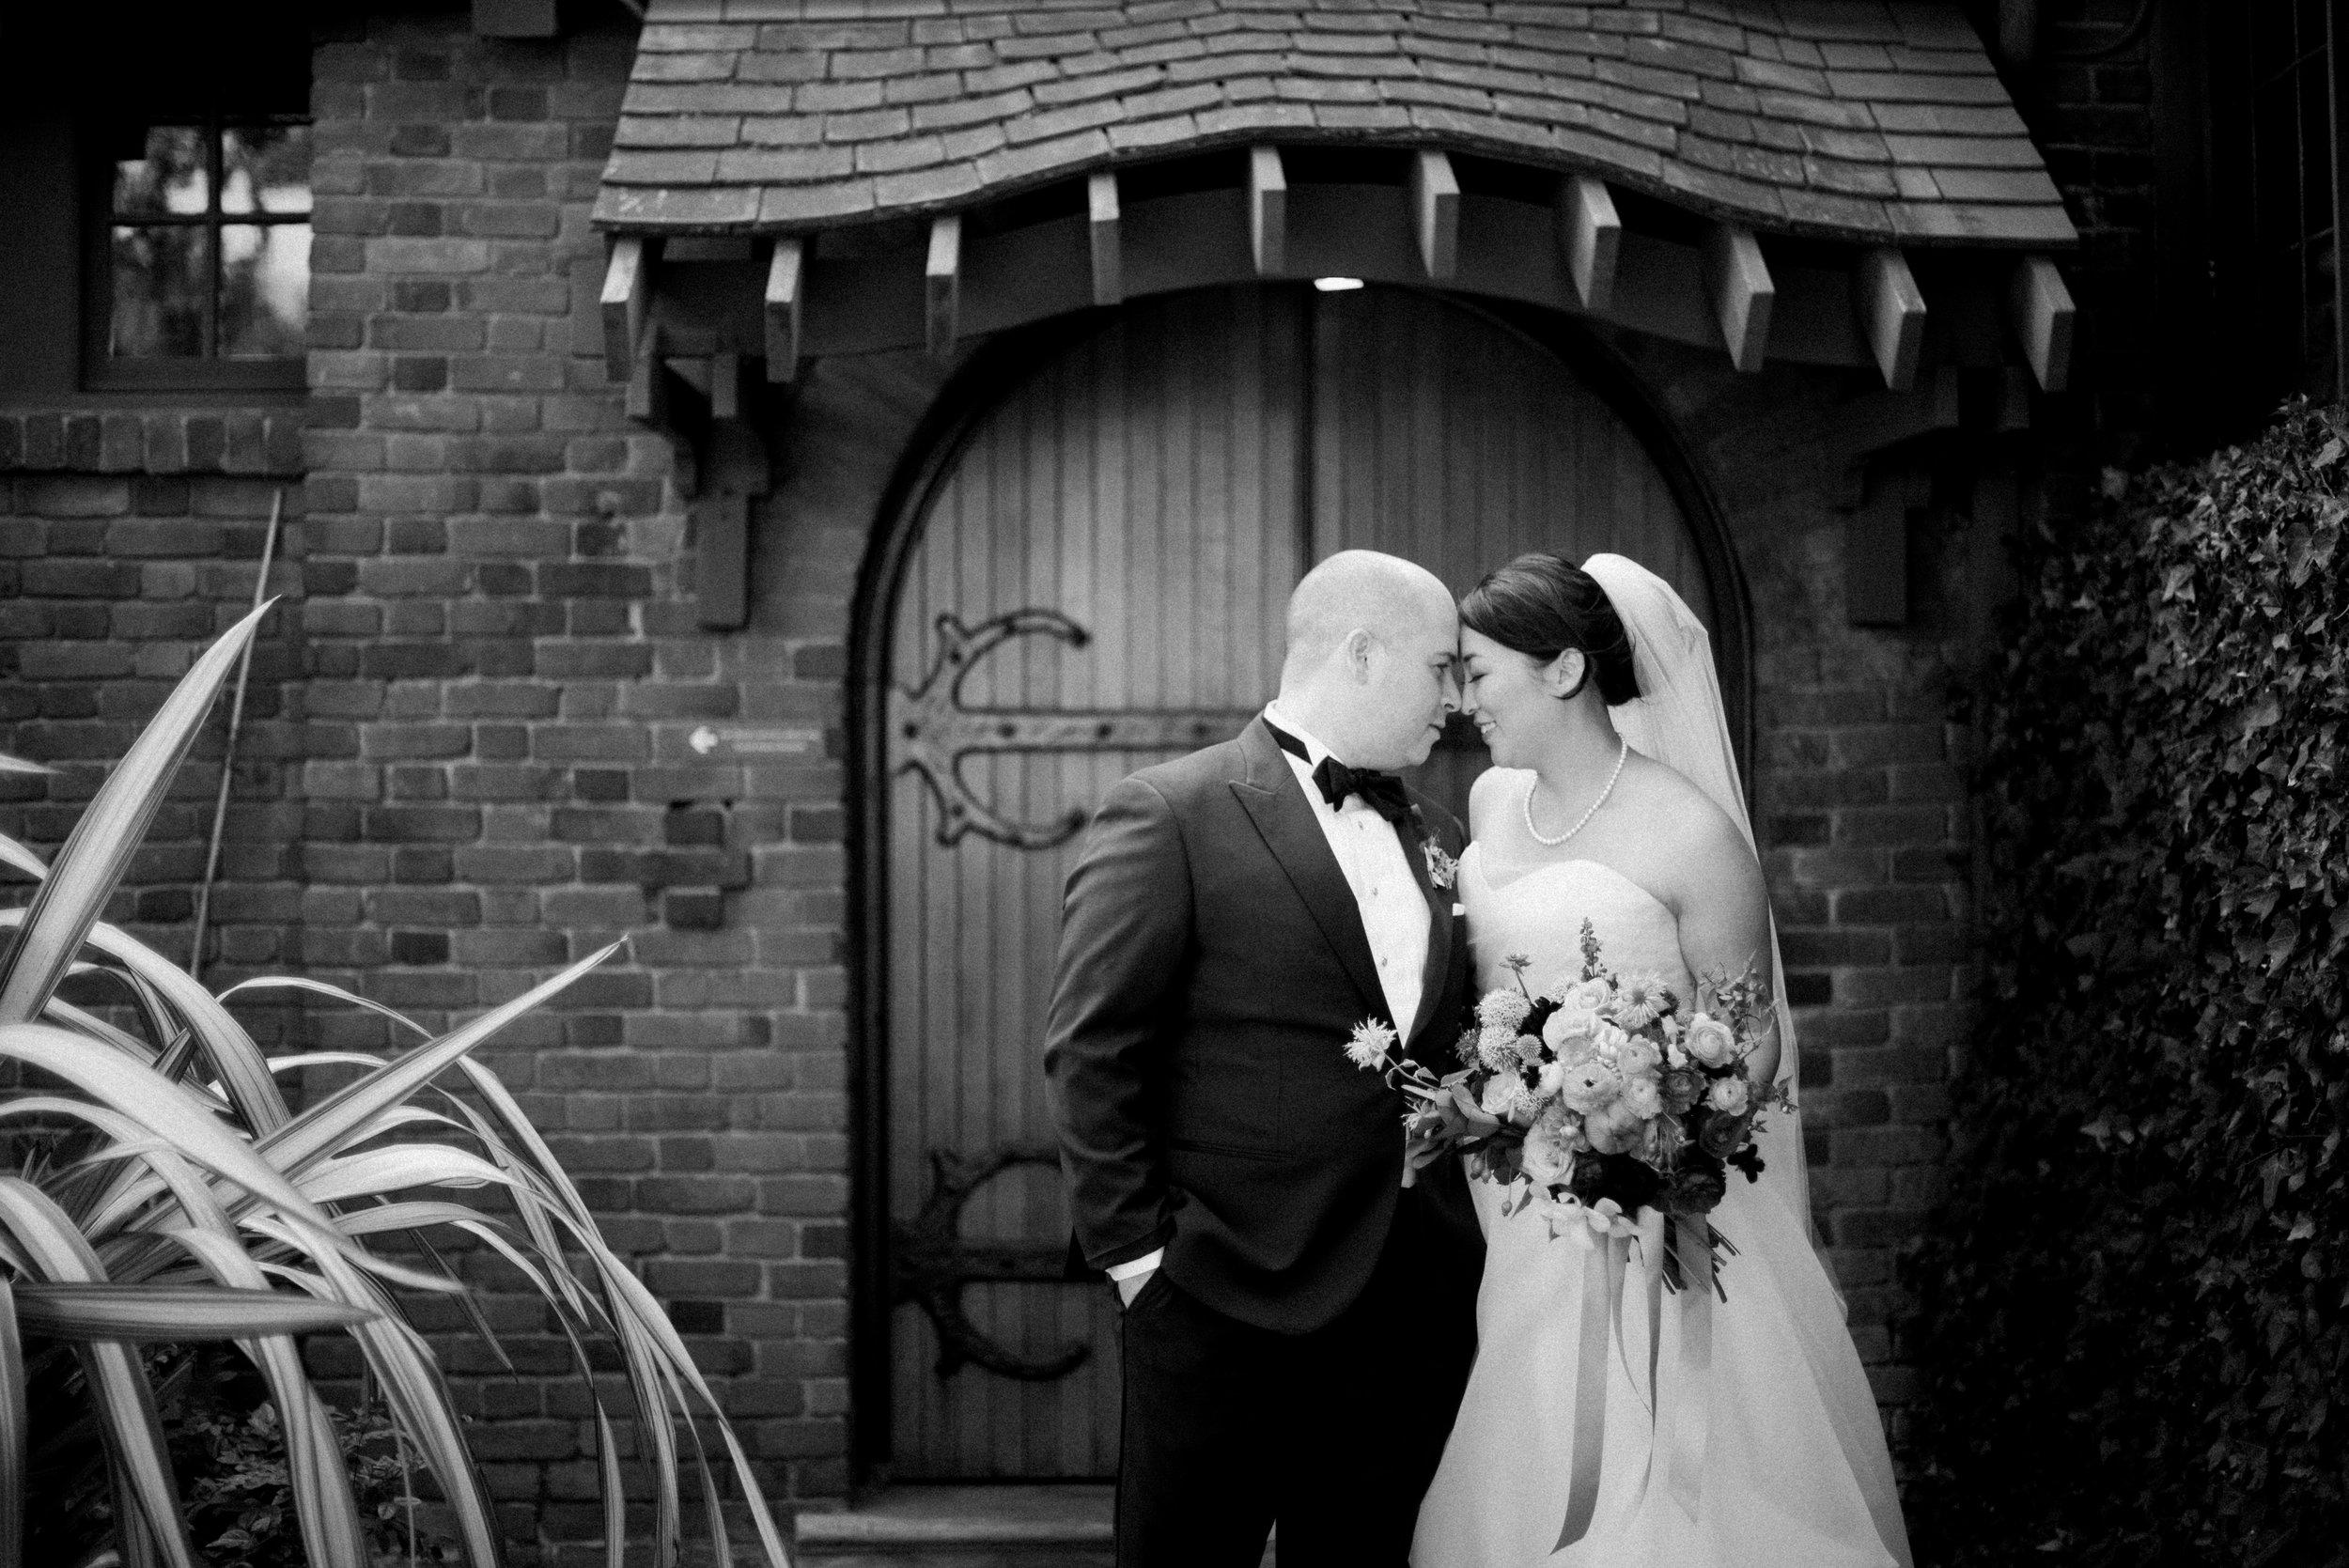 Swedenborgian Church Dogpatch Winery Wedding041.jpg